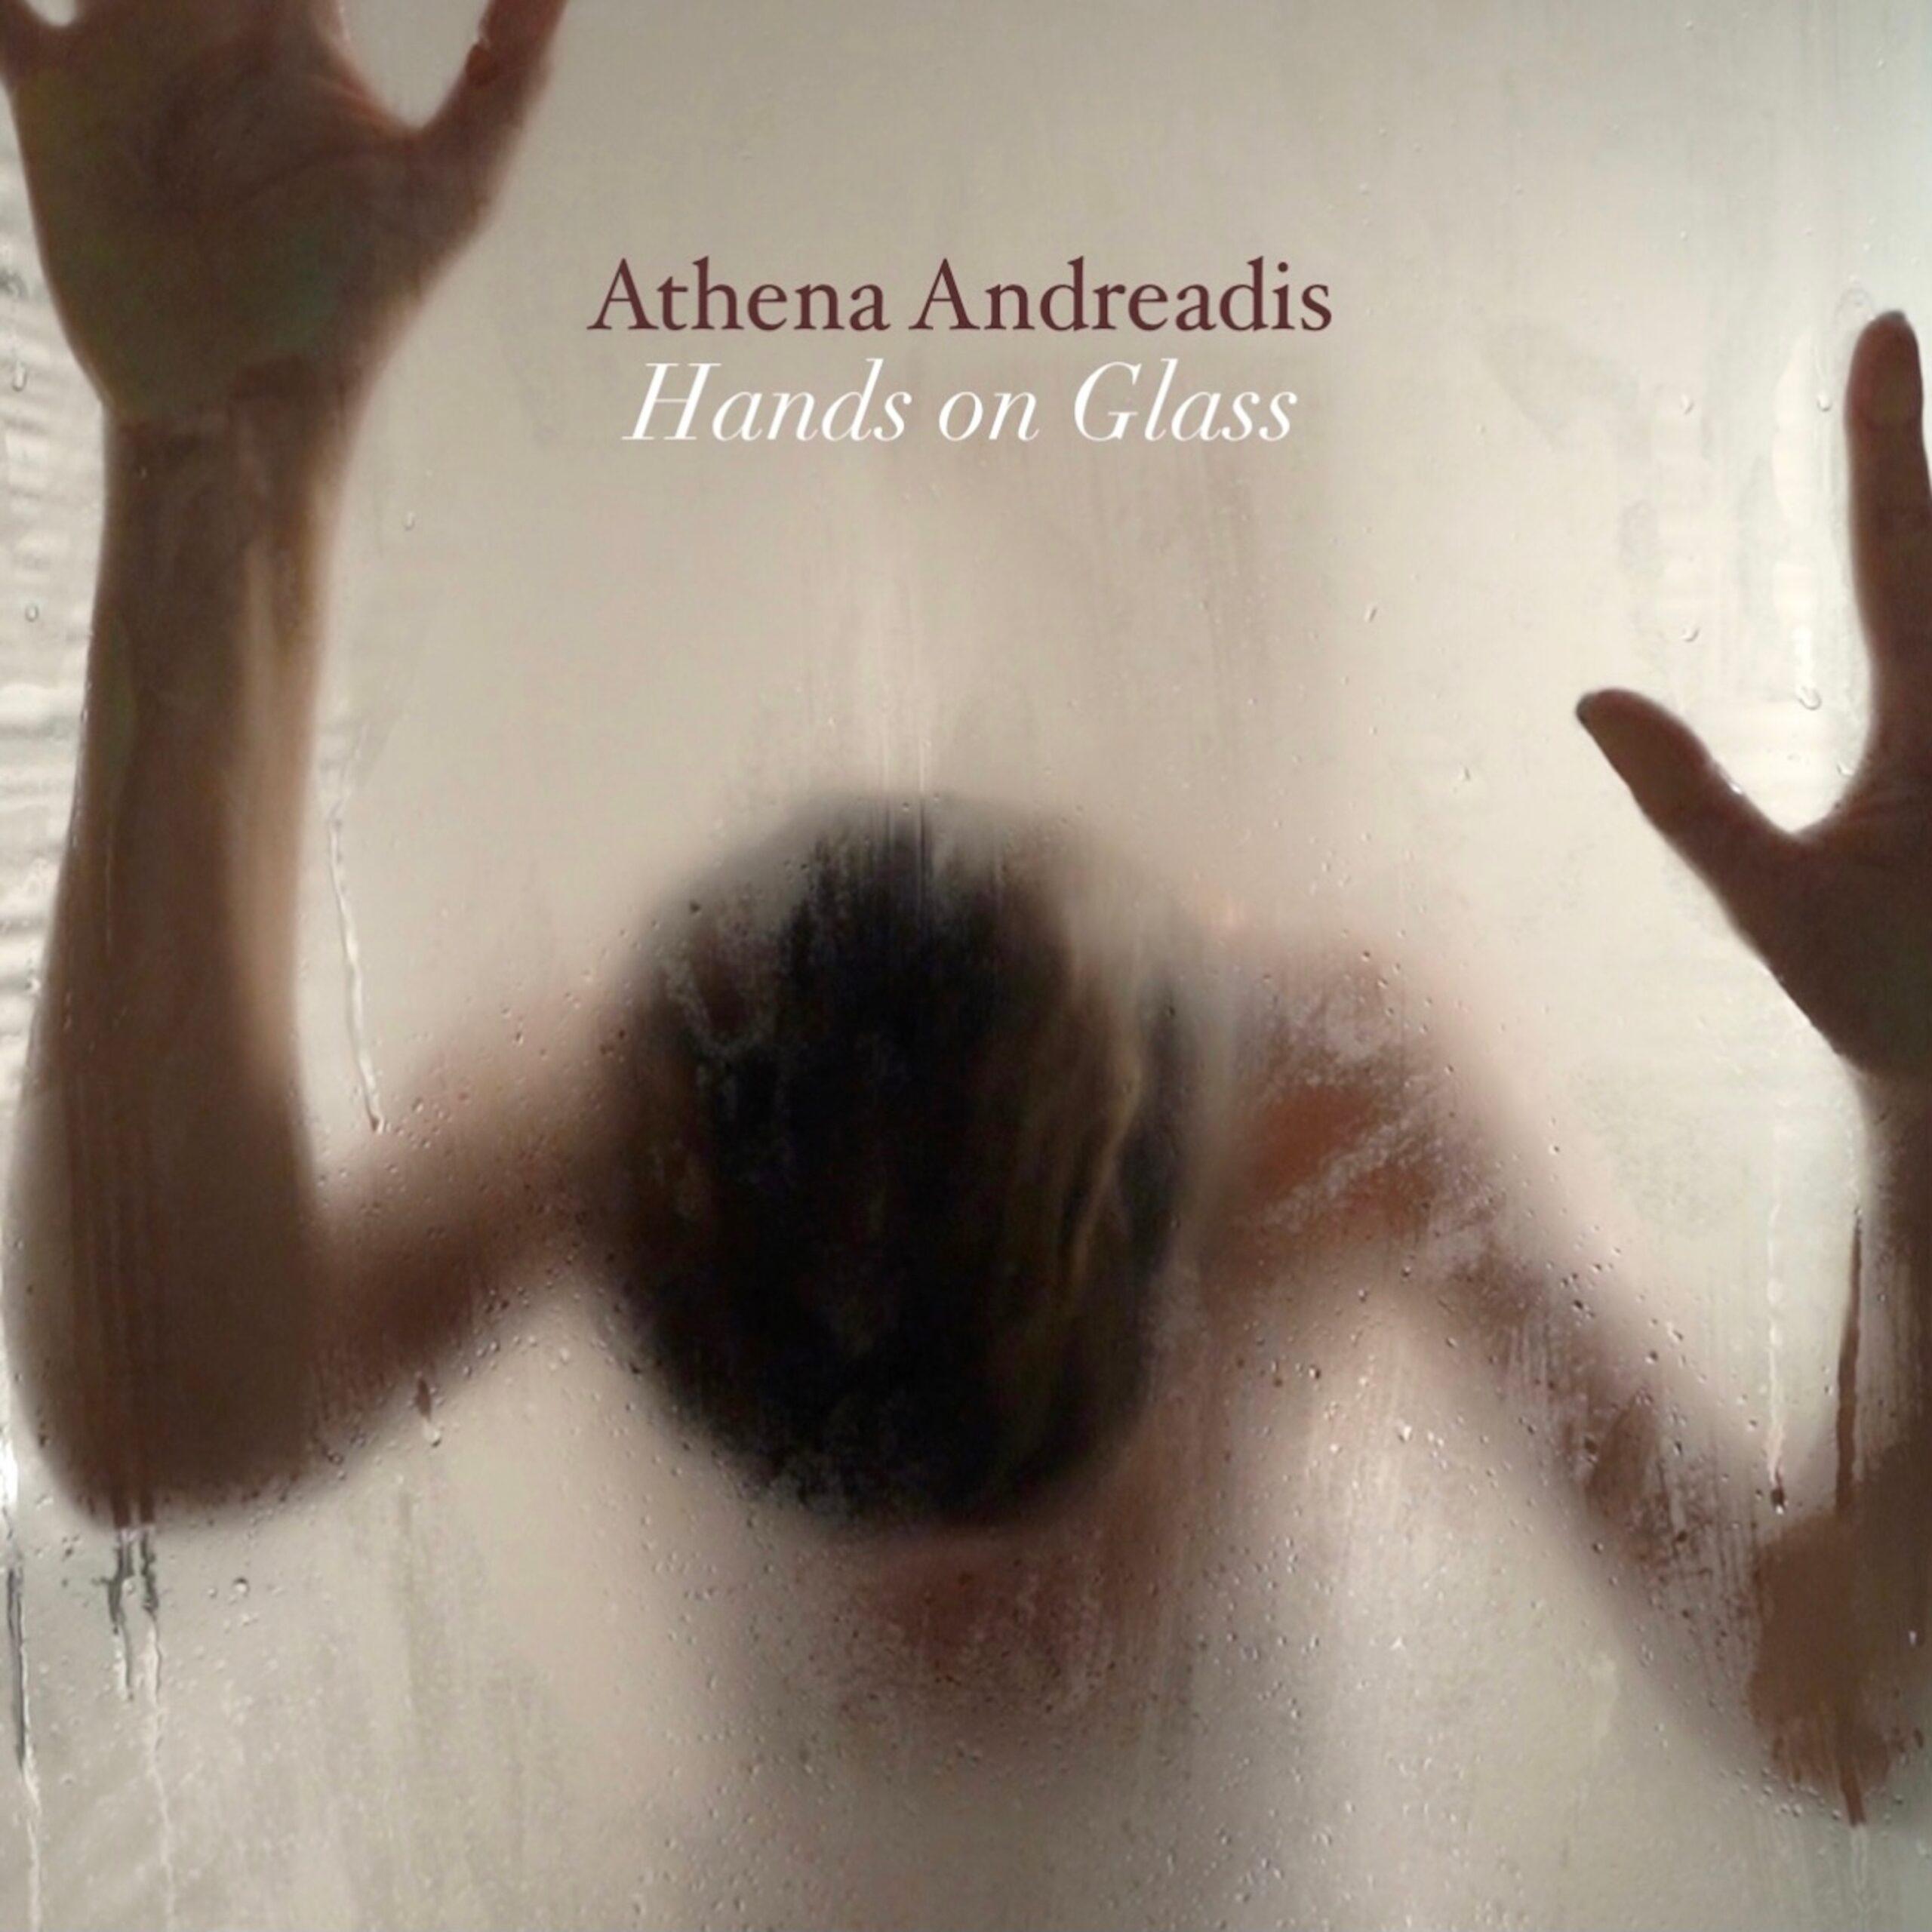 Athena Andreadis - outside of time